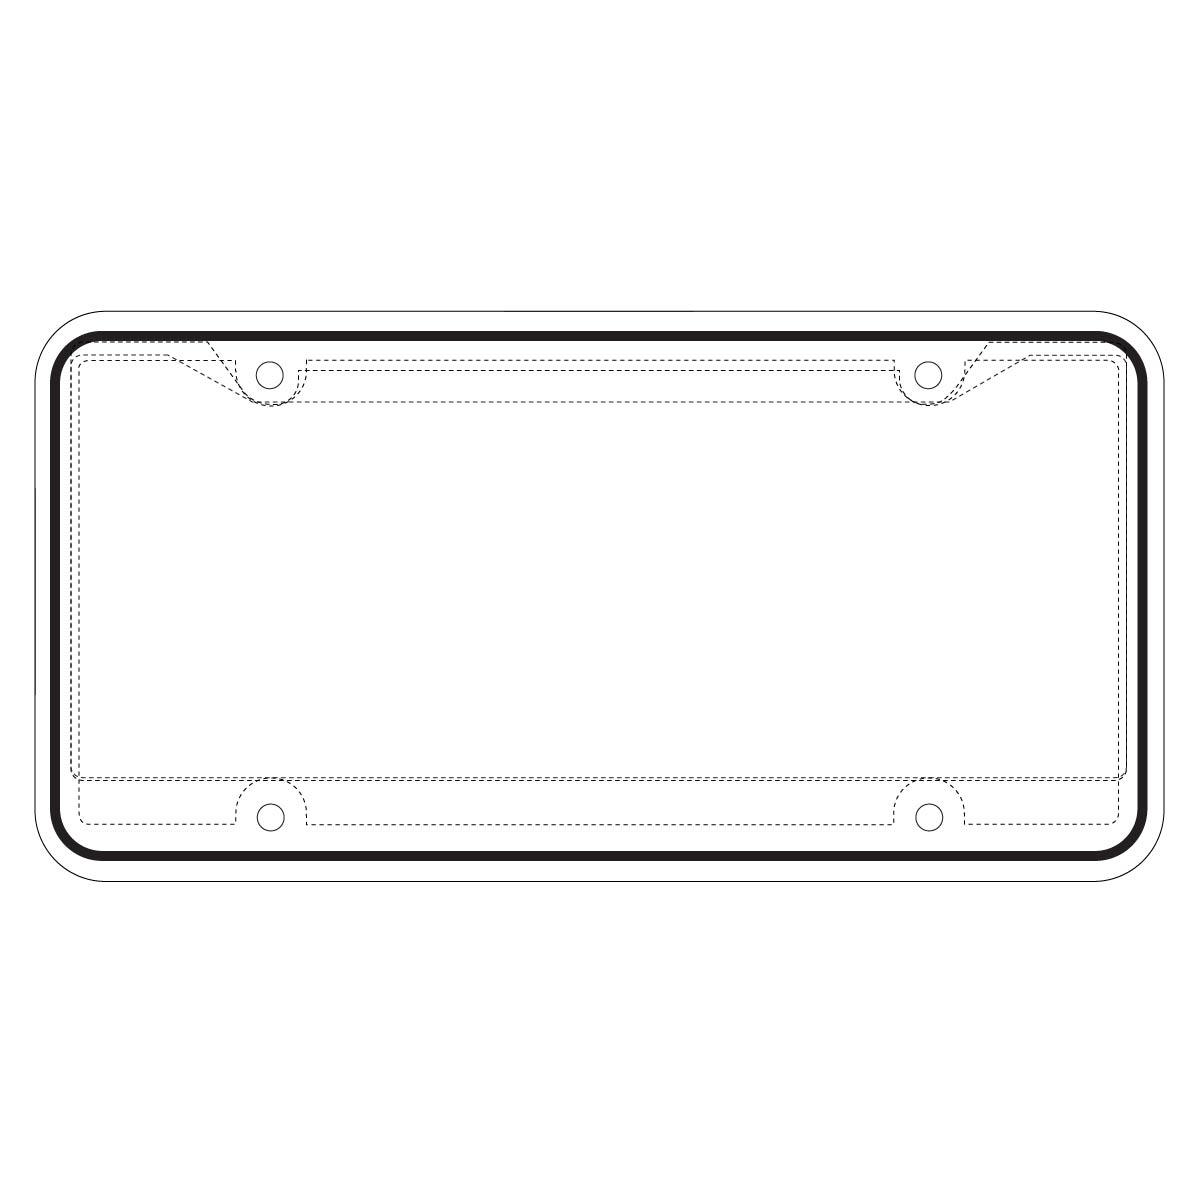 Upload Your Own Custom Silk Screened Frame